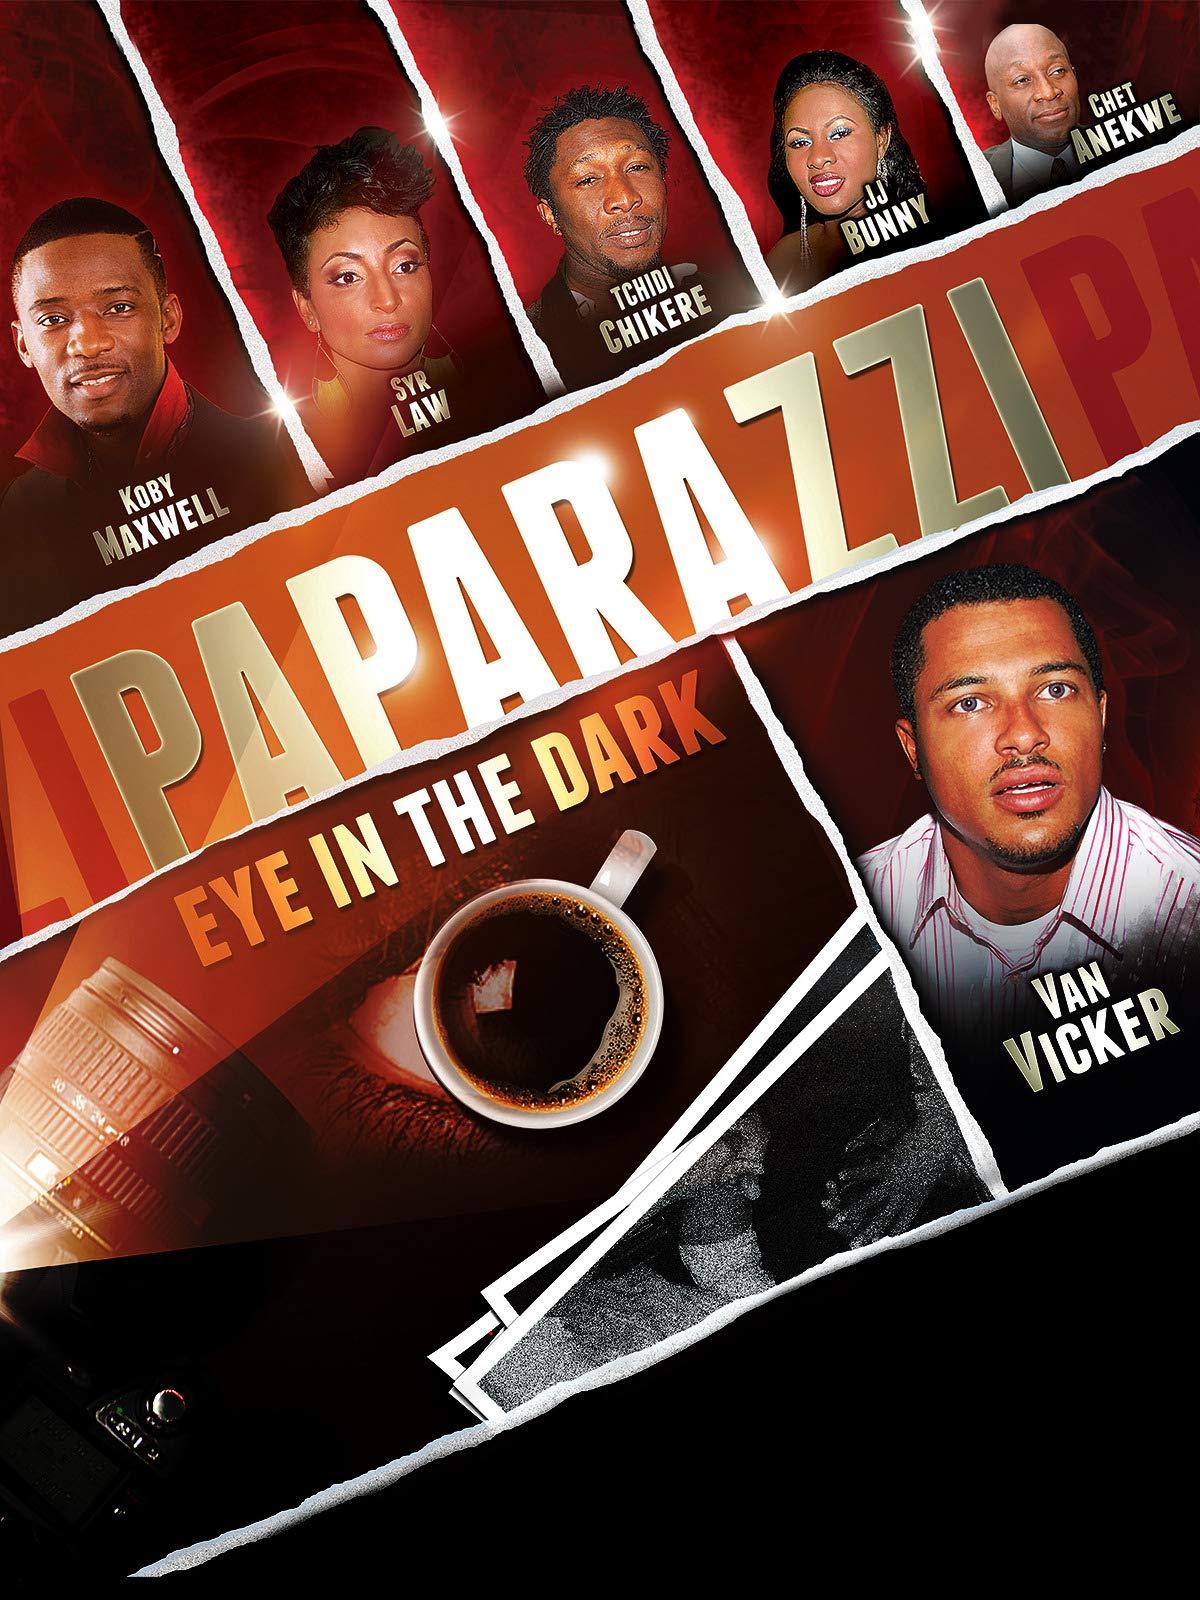 Paparazzi Eye In The Dark